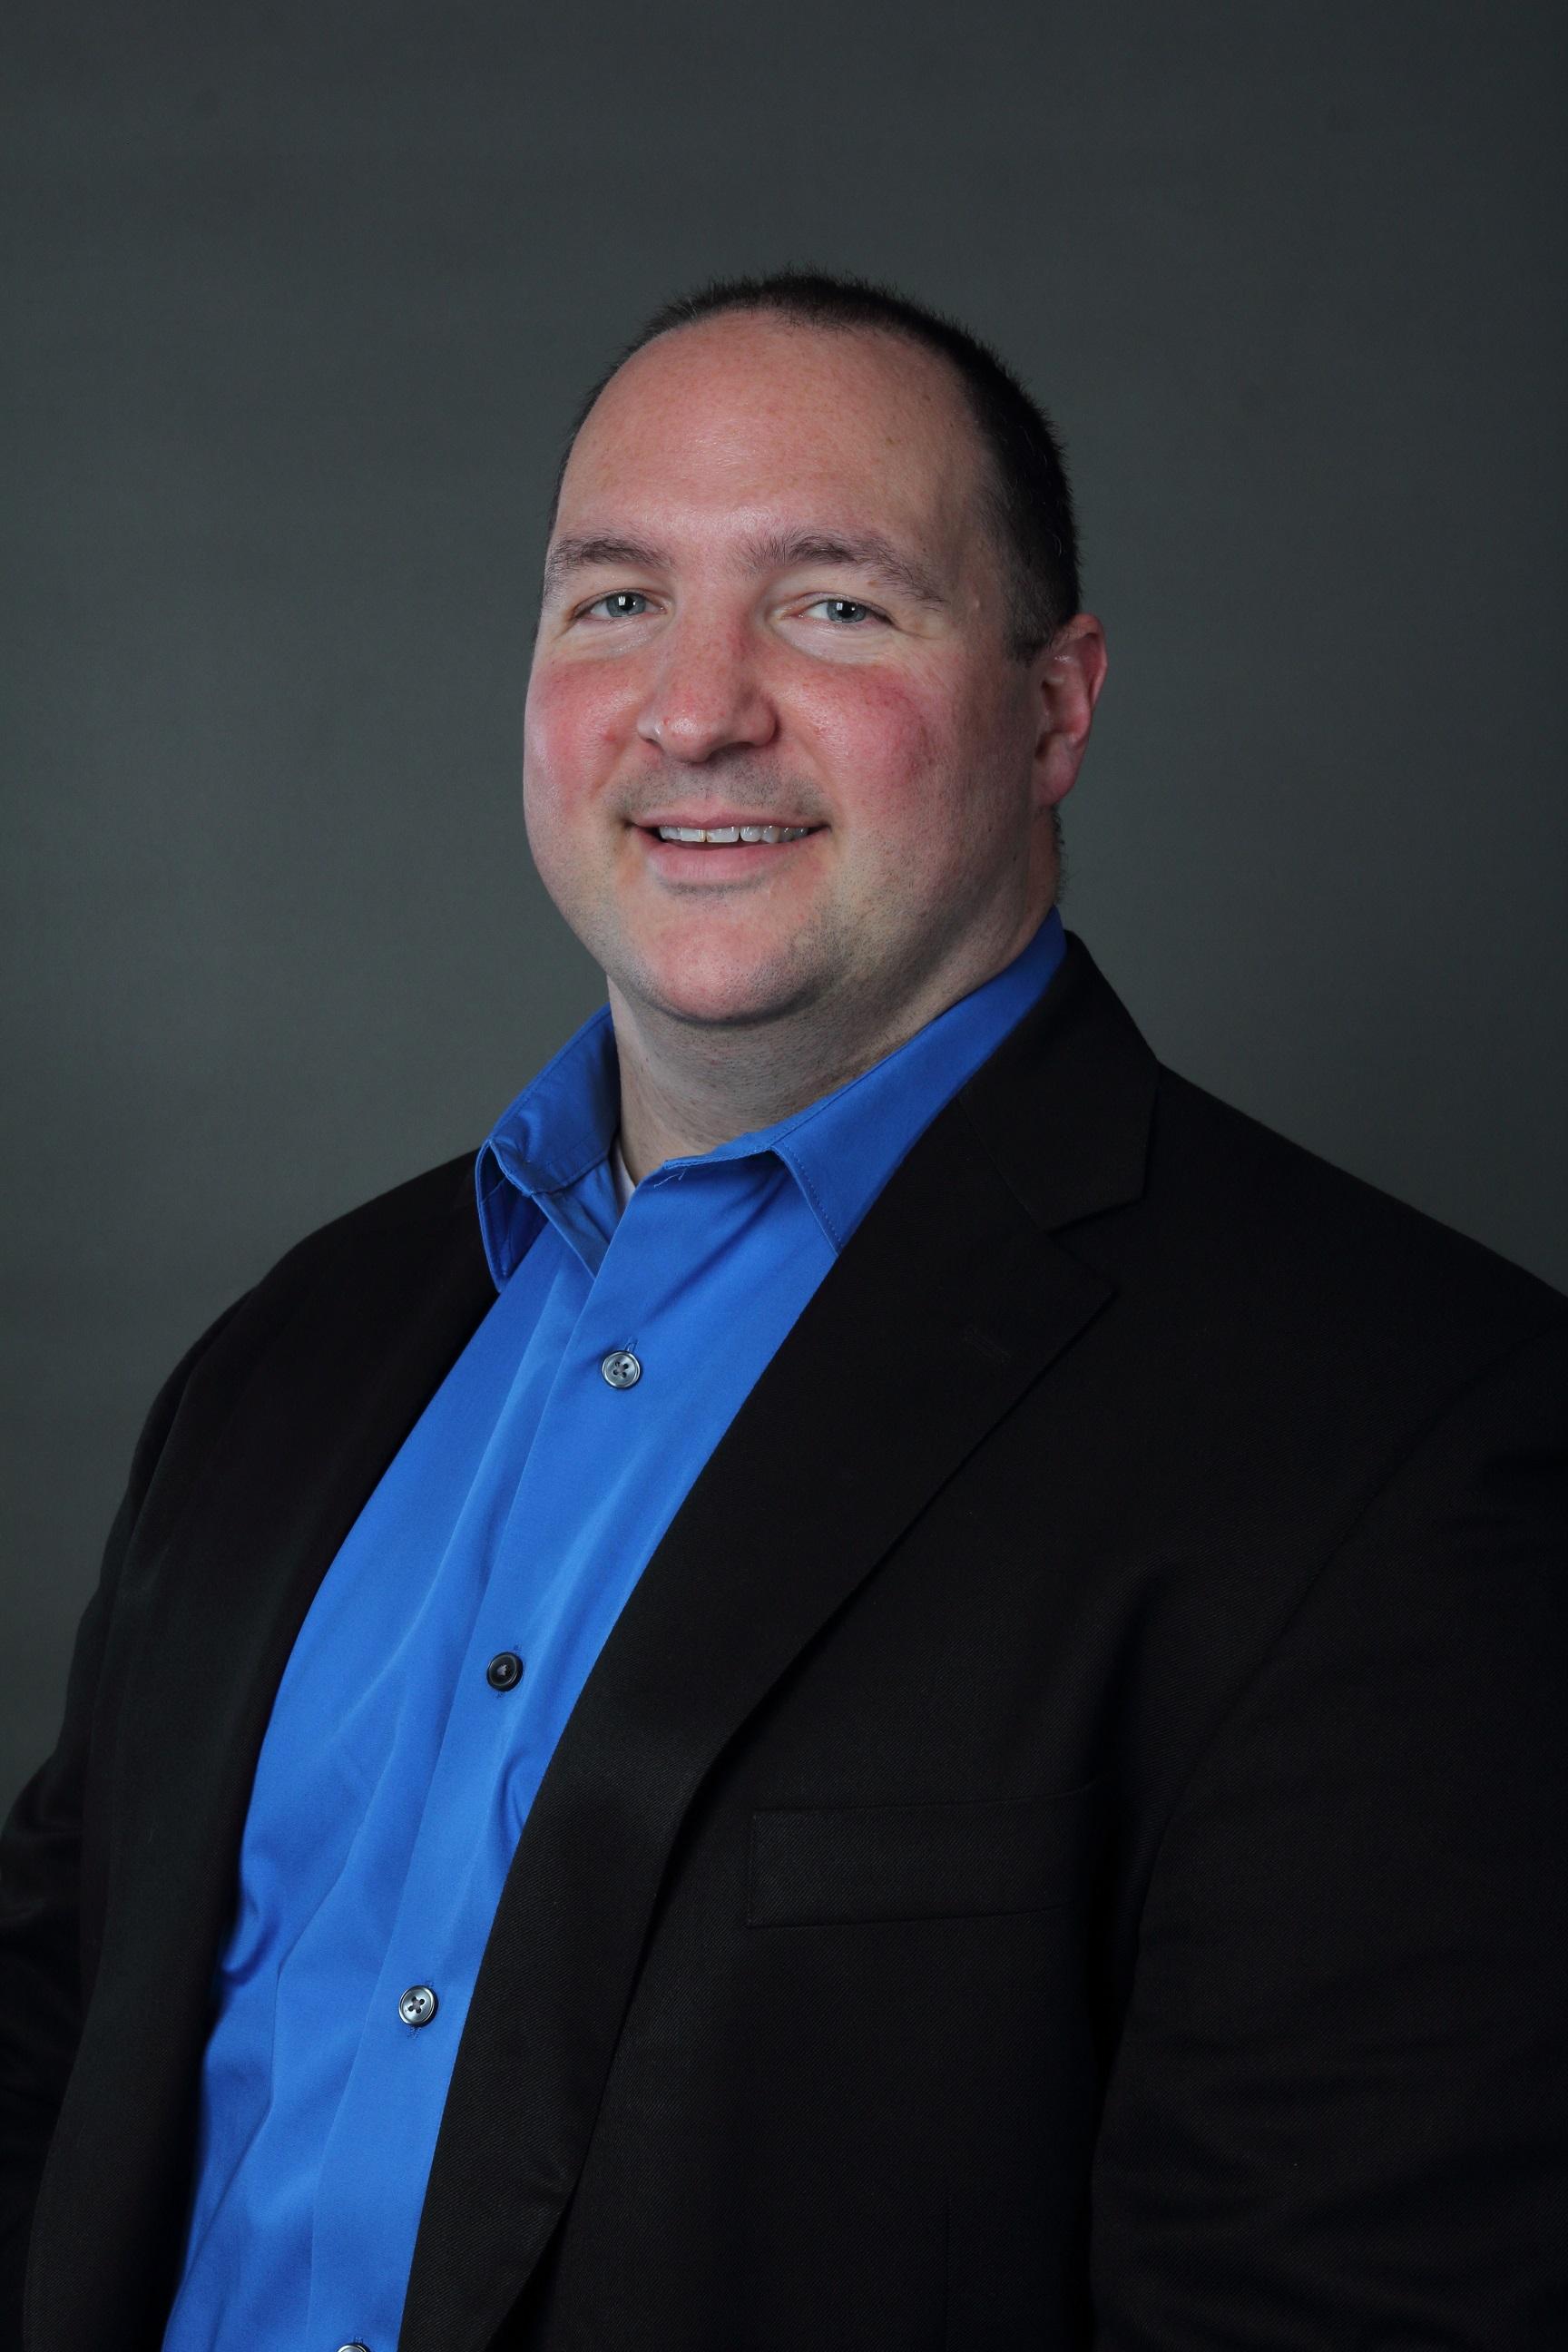 cyber security firm btb security makes philadelphia 100